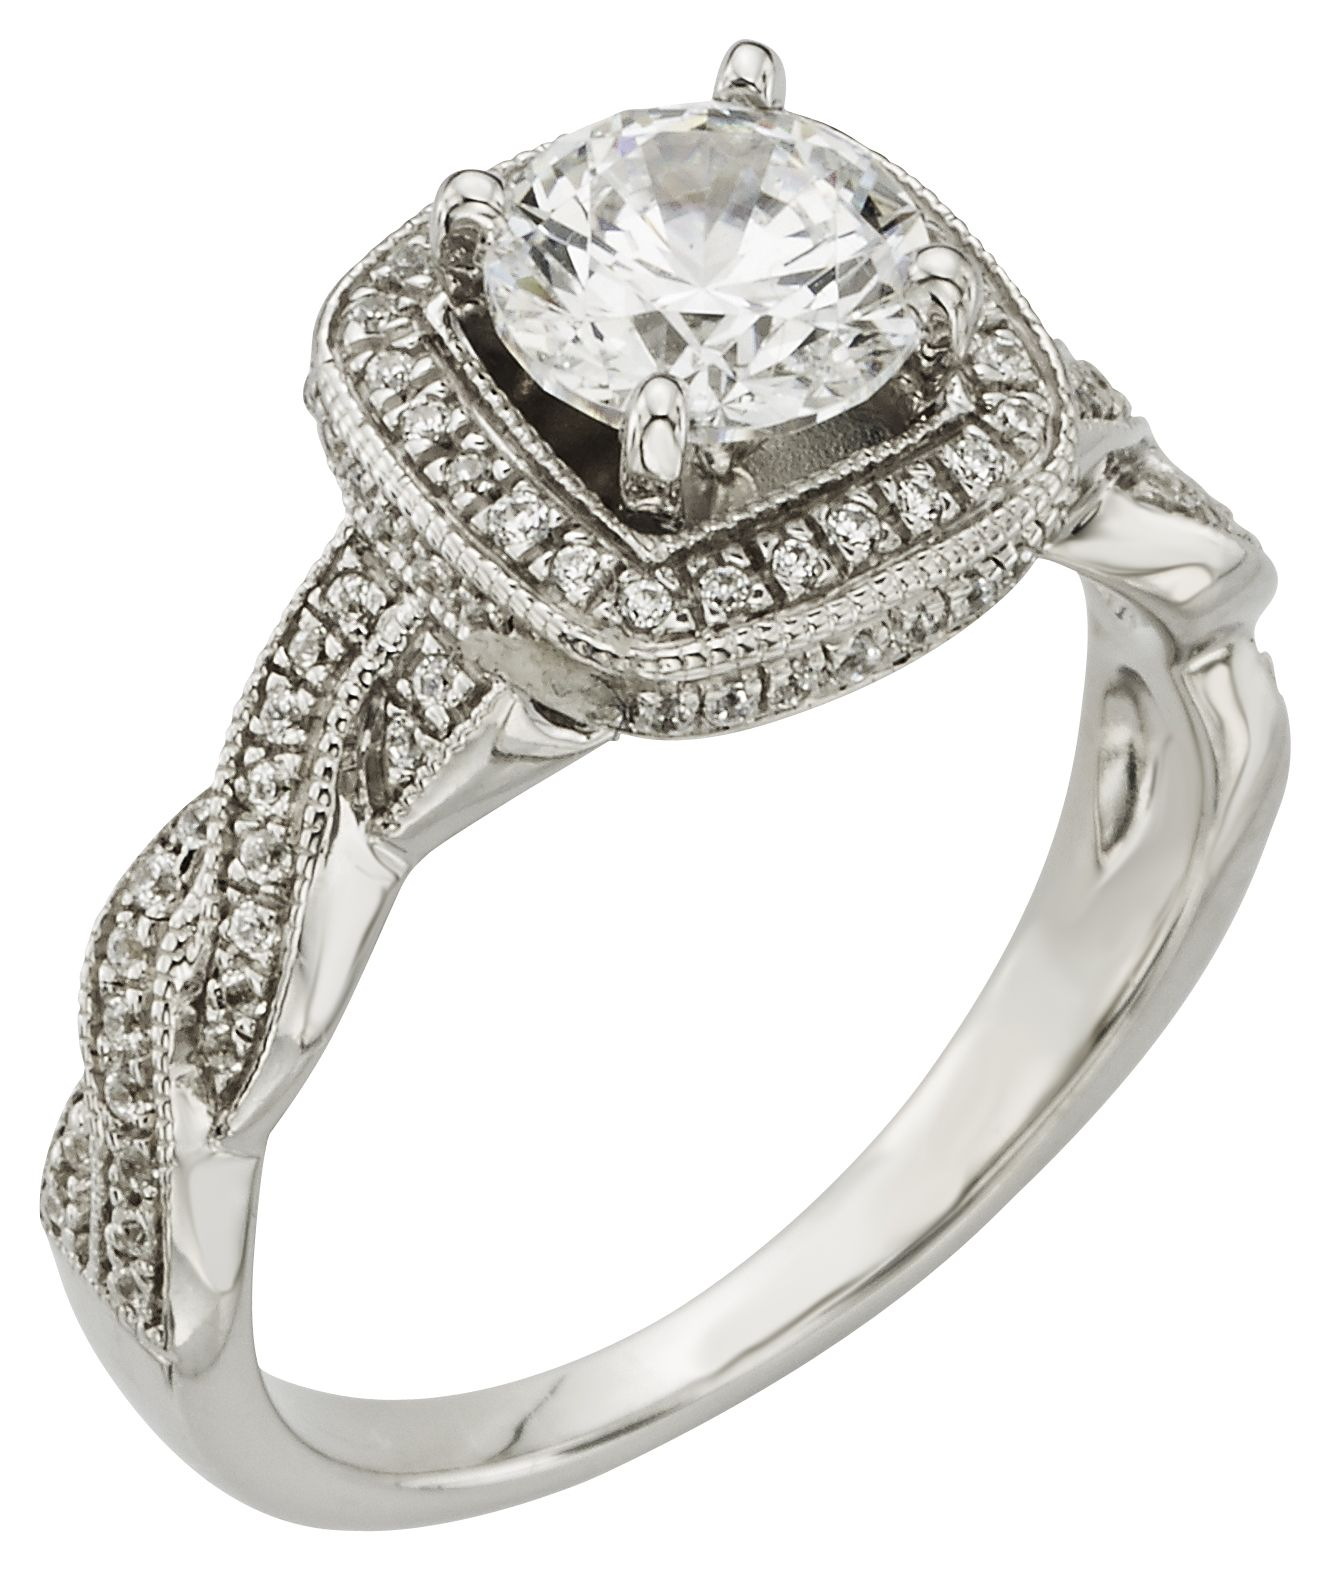 Braided band detailing... MercuryRing diamonds